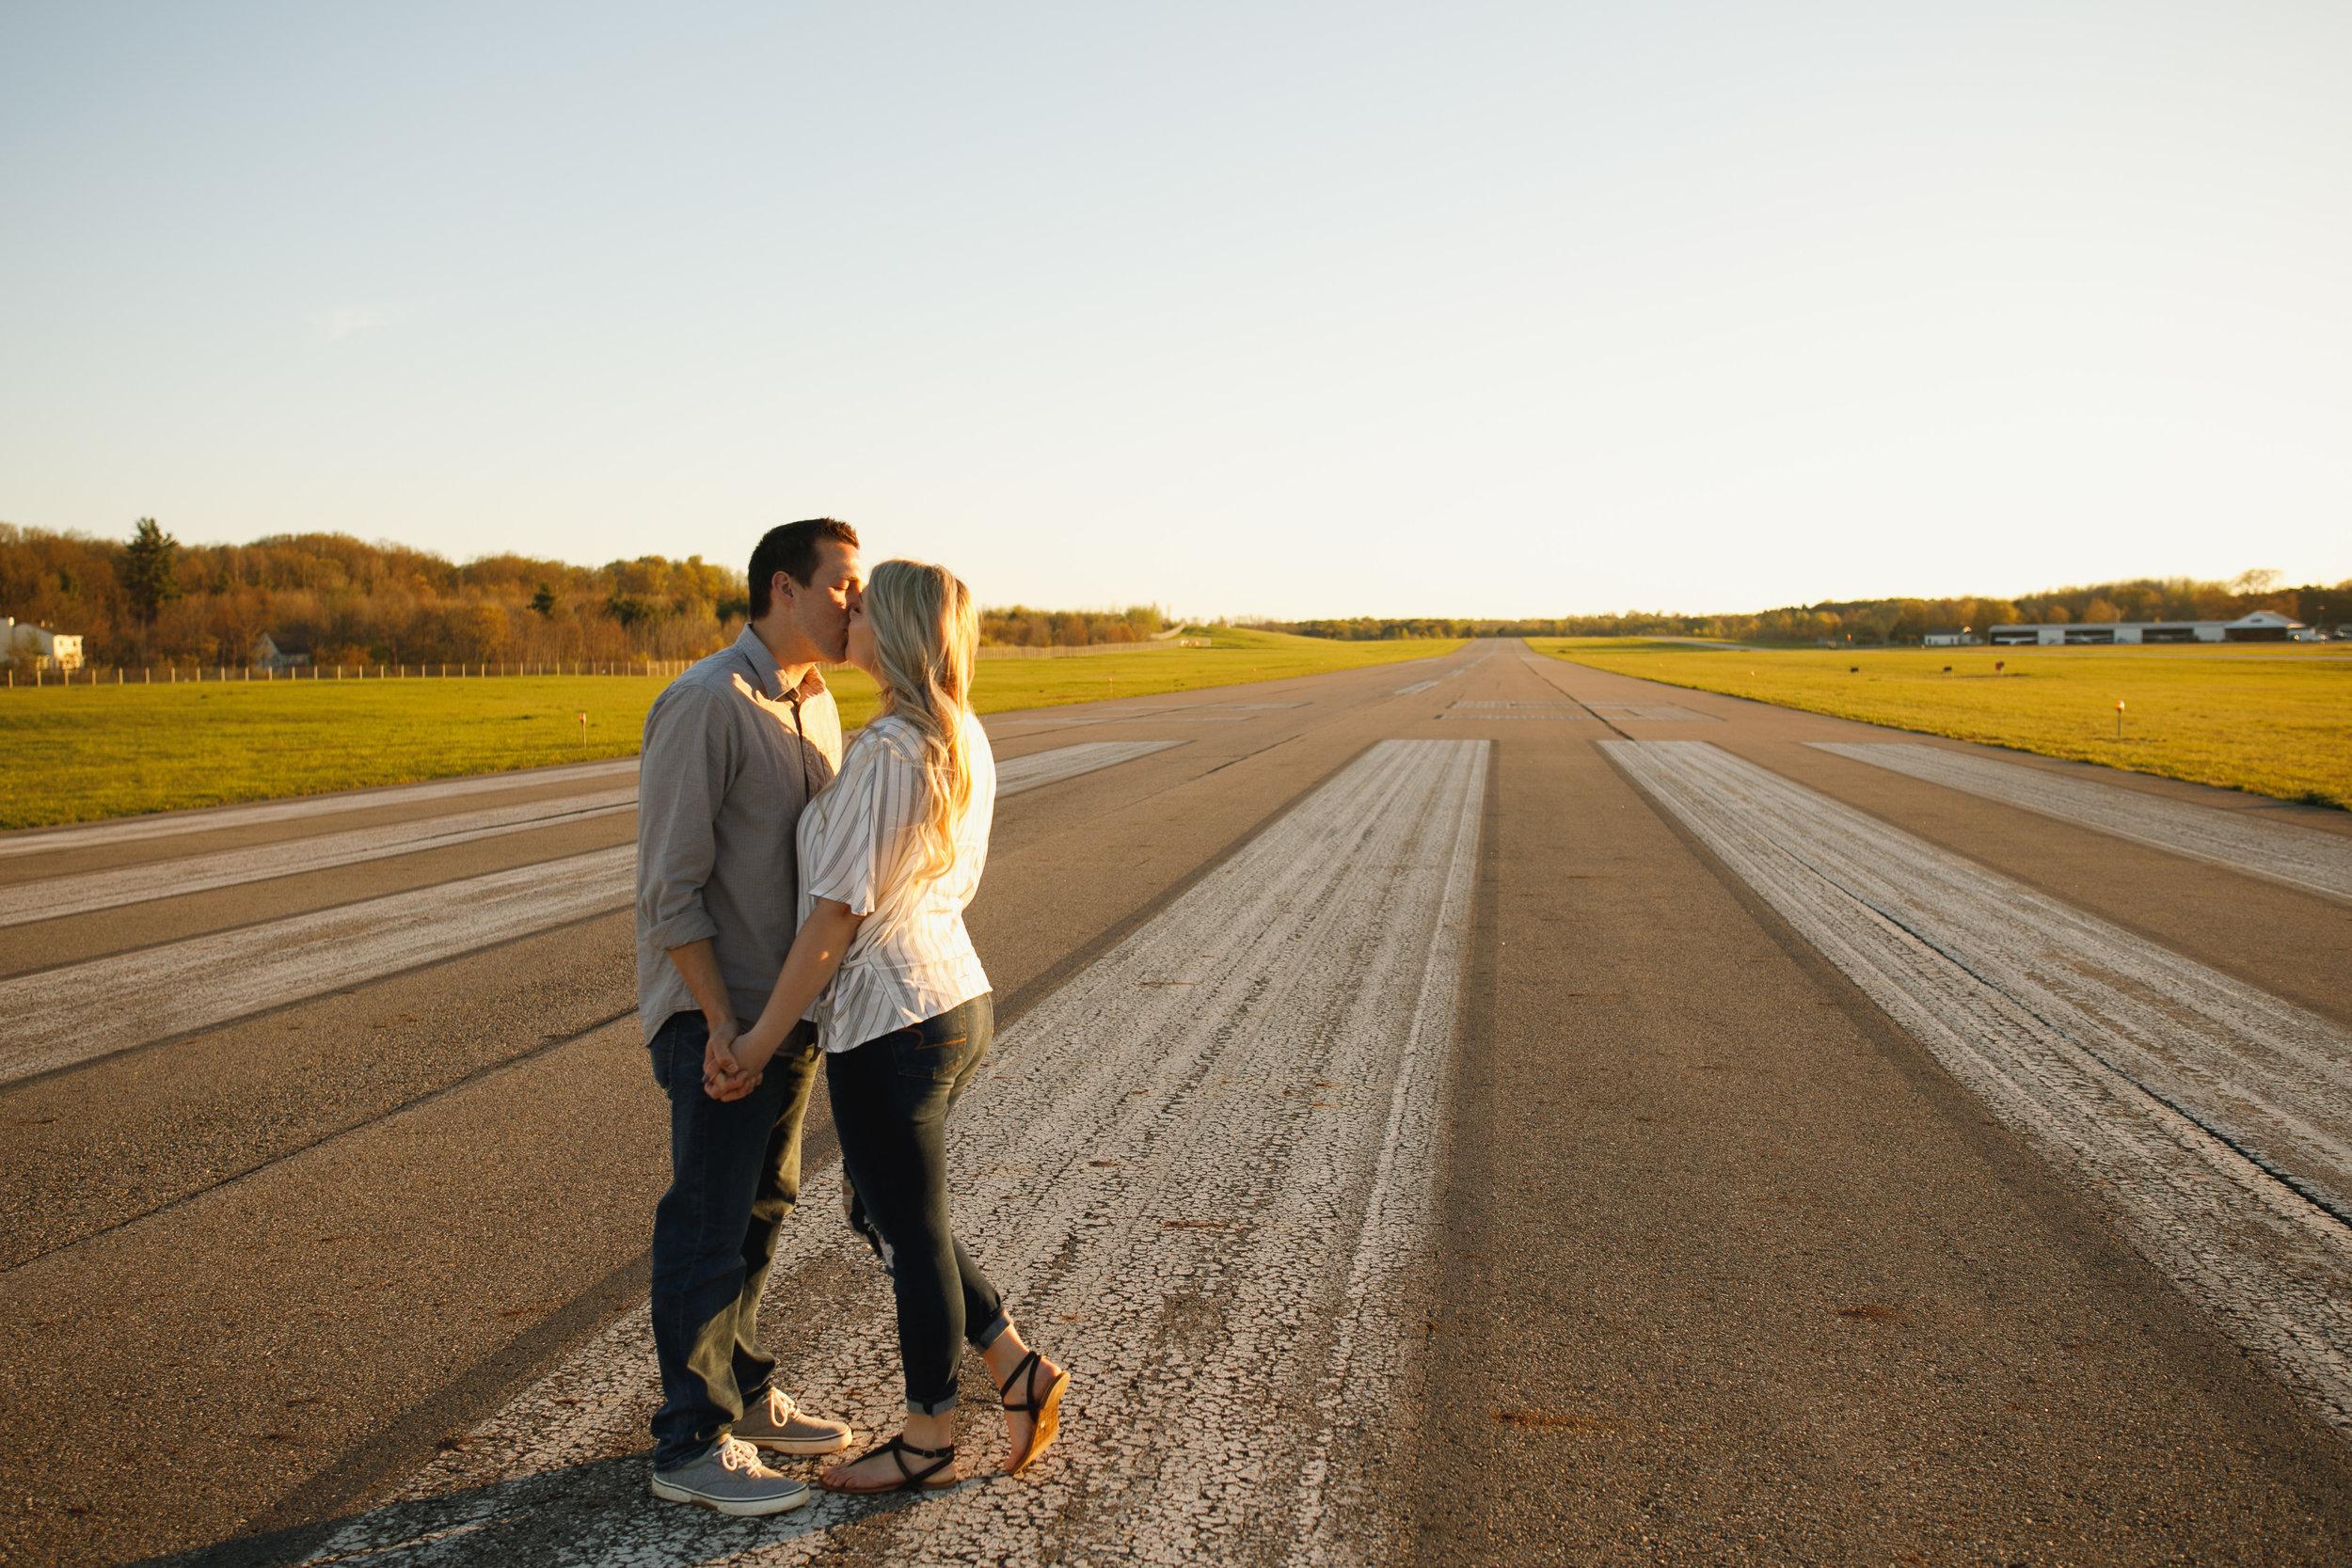 Grand Rapids Photographer - J Darling Photo - jessica darling - grand rapids wedding photographer - sparta airport - sparta michigan - jasmine and jeff engaged 045.jpg